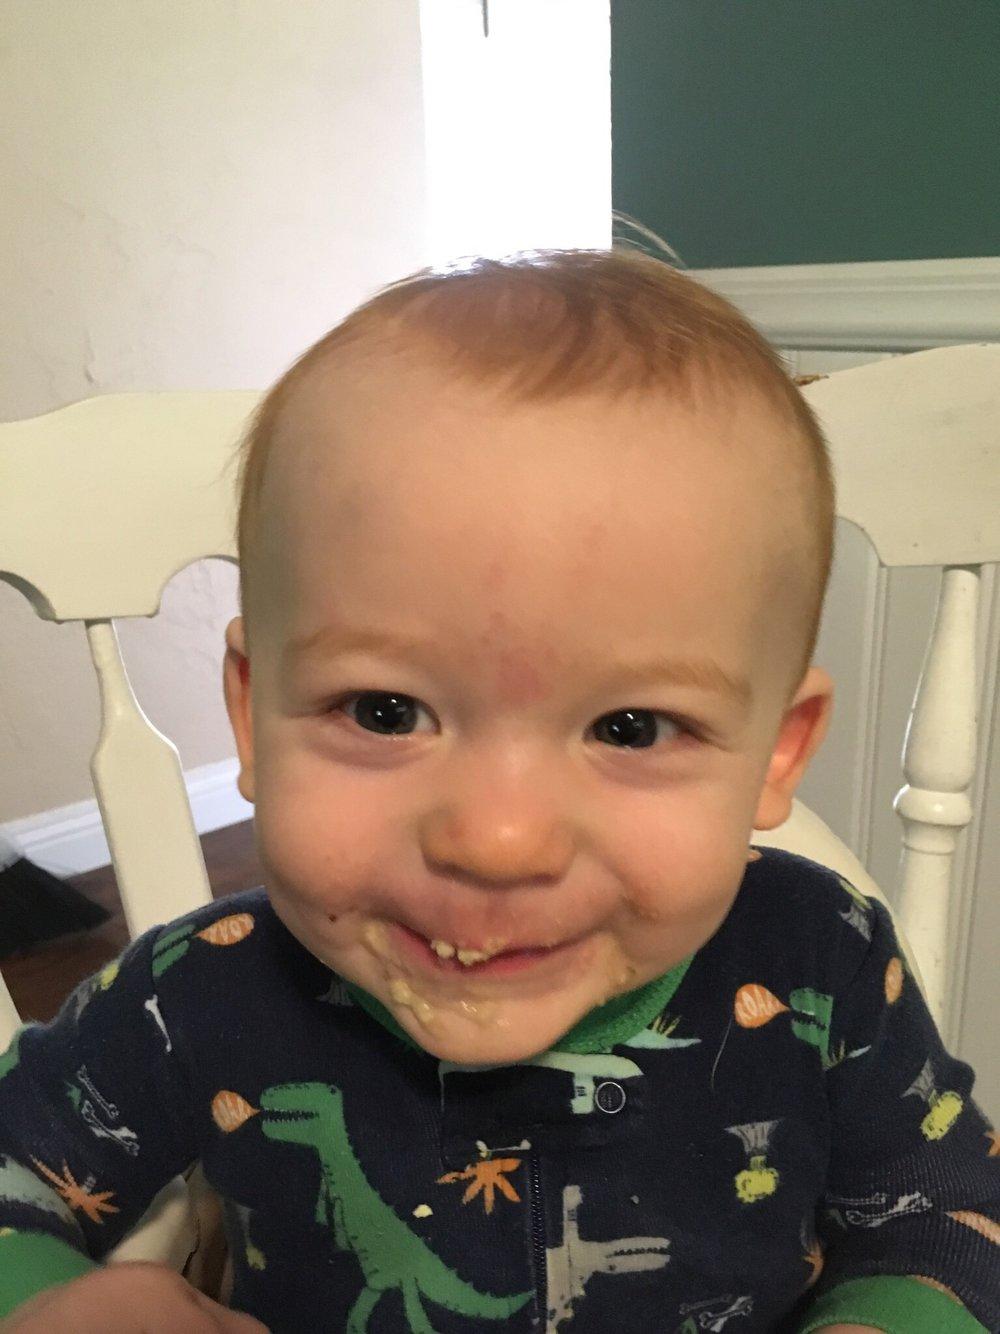 Joshua after eating bananas